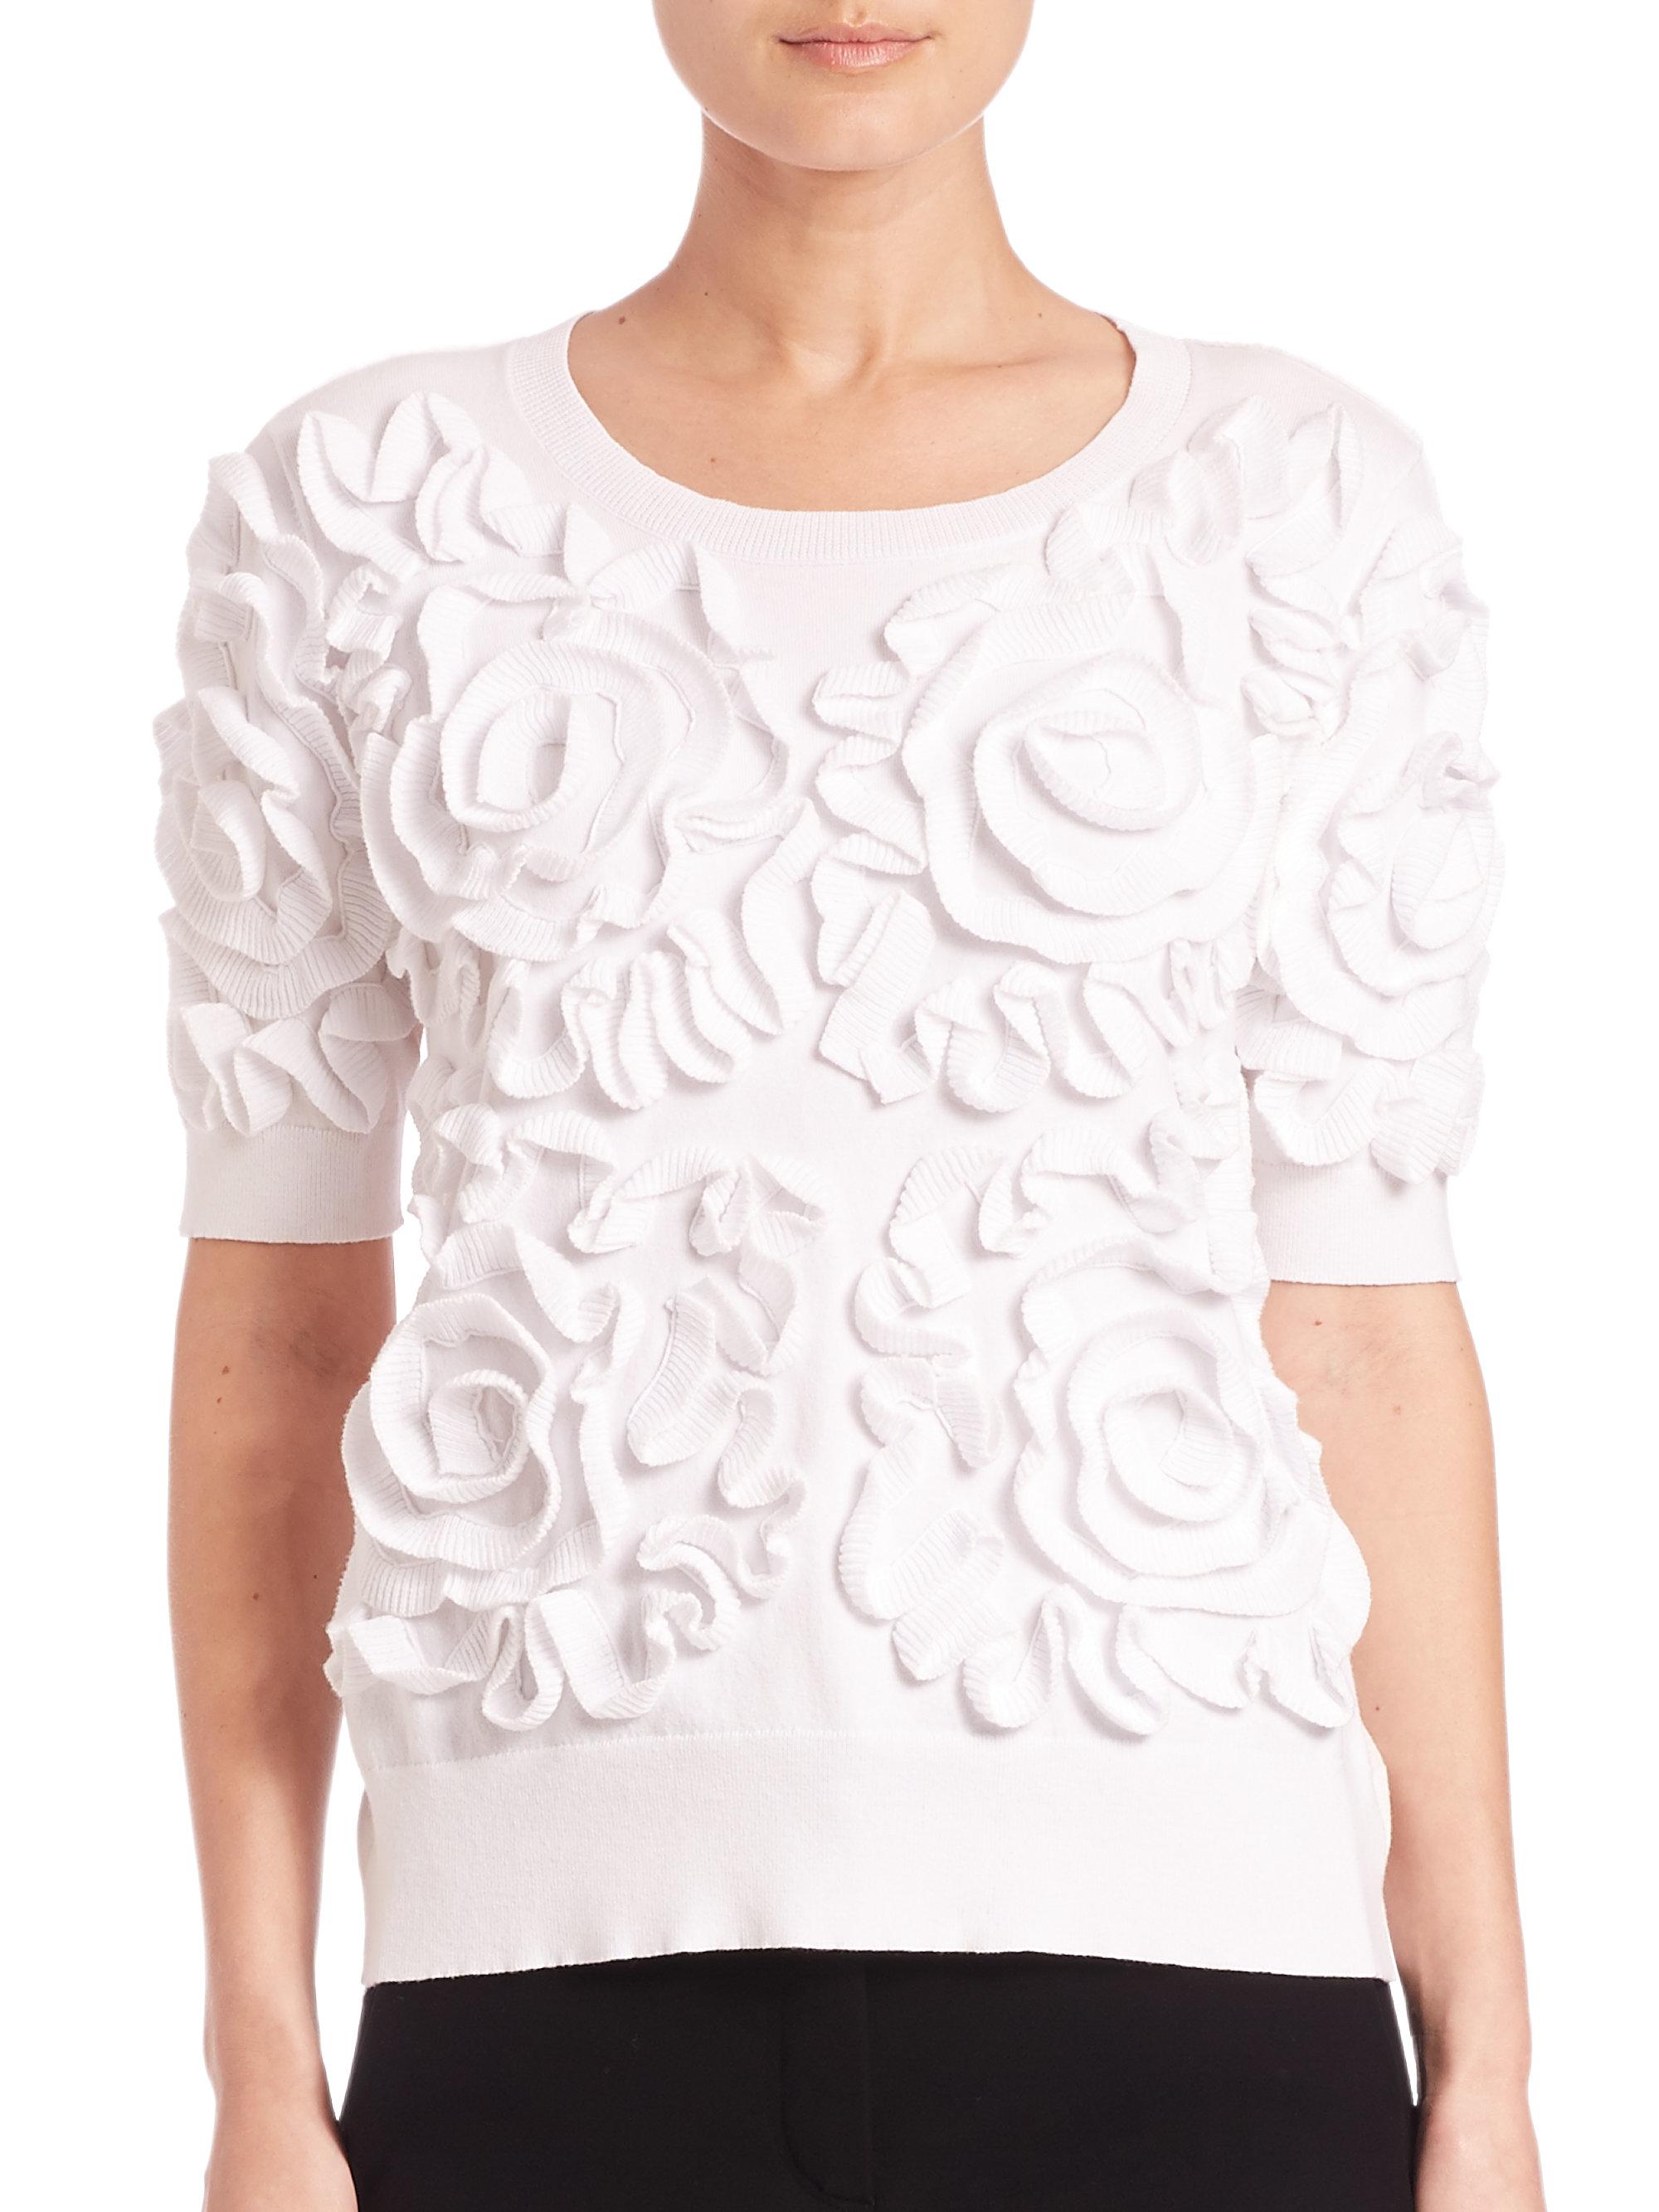 sonia-by-sonia-rykiel-white-floral-frill